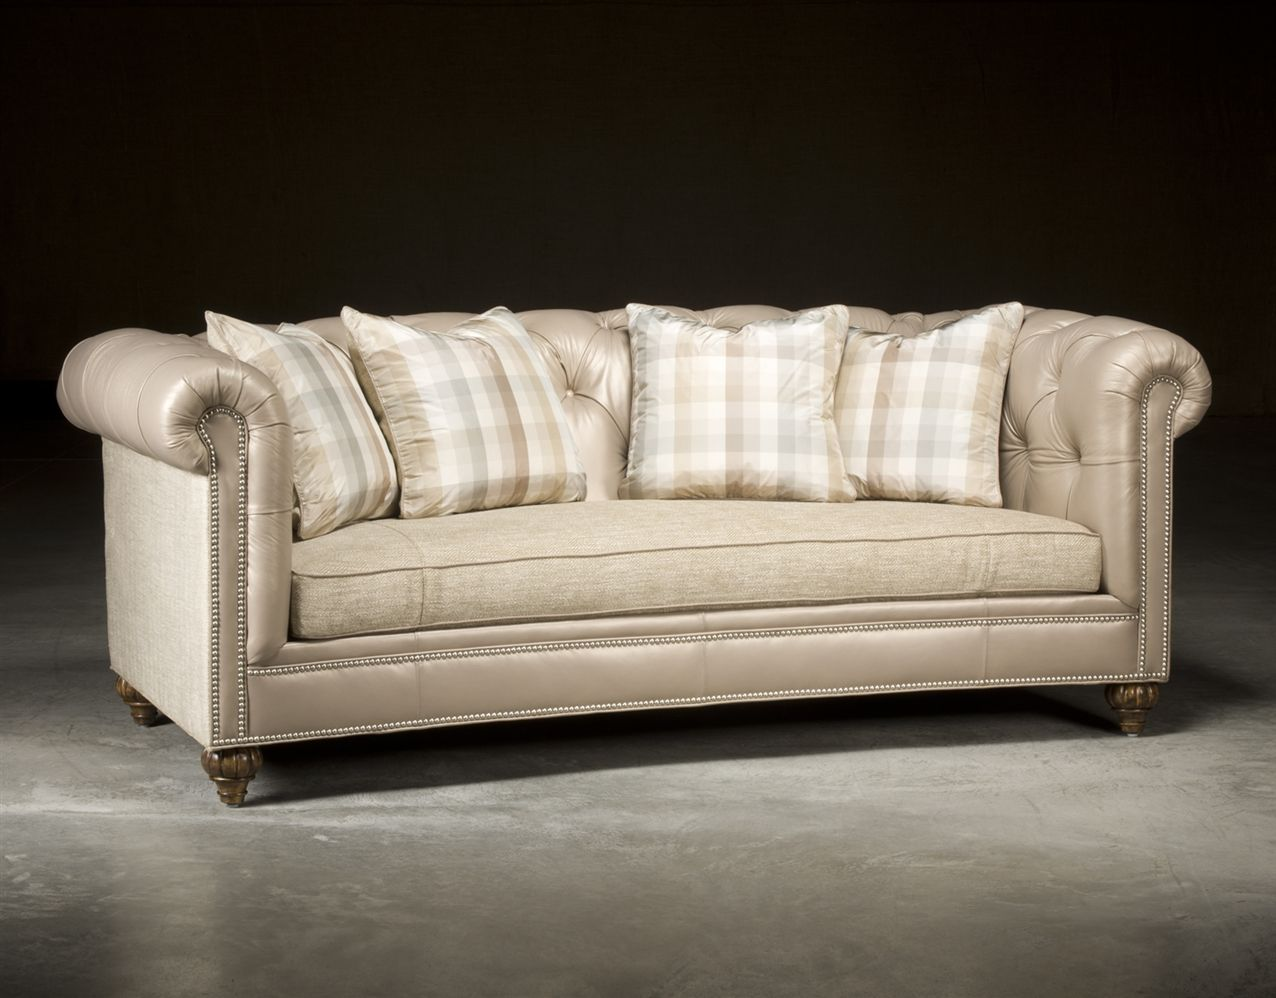 High End Designer Sofas Sofa 72 Qty Description Chesterfield Tufted